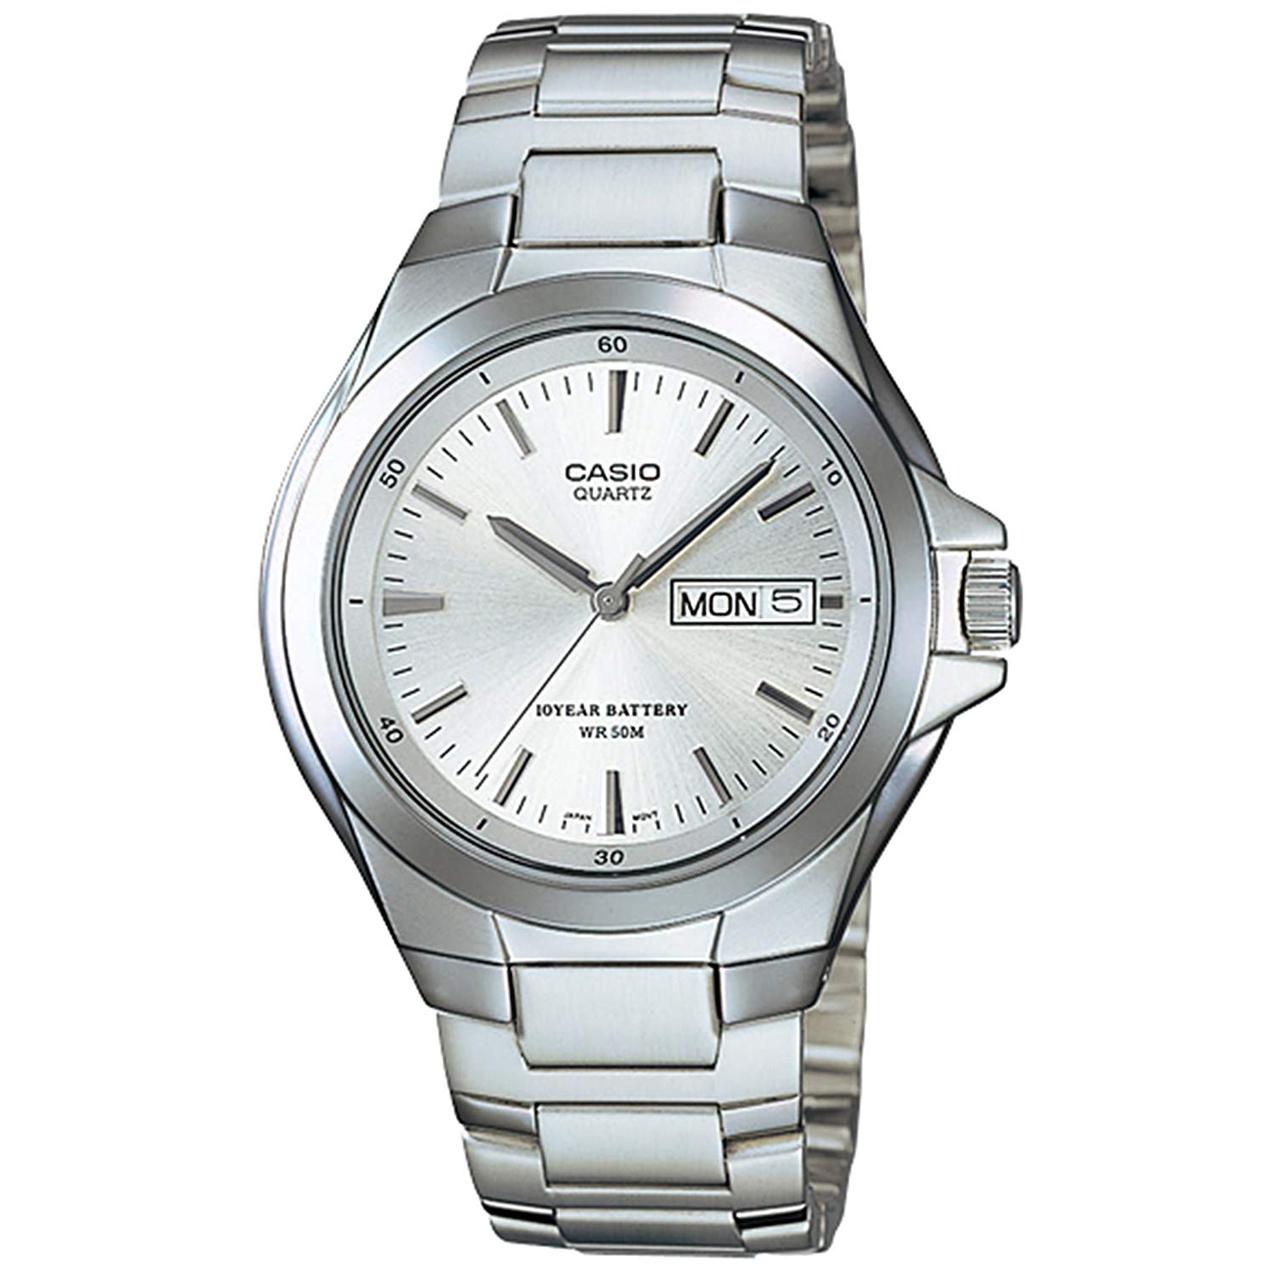 ساعت  کاسیو مدل MTP-1228D-7AVDF